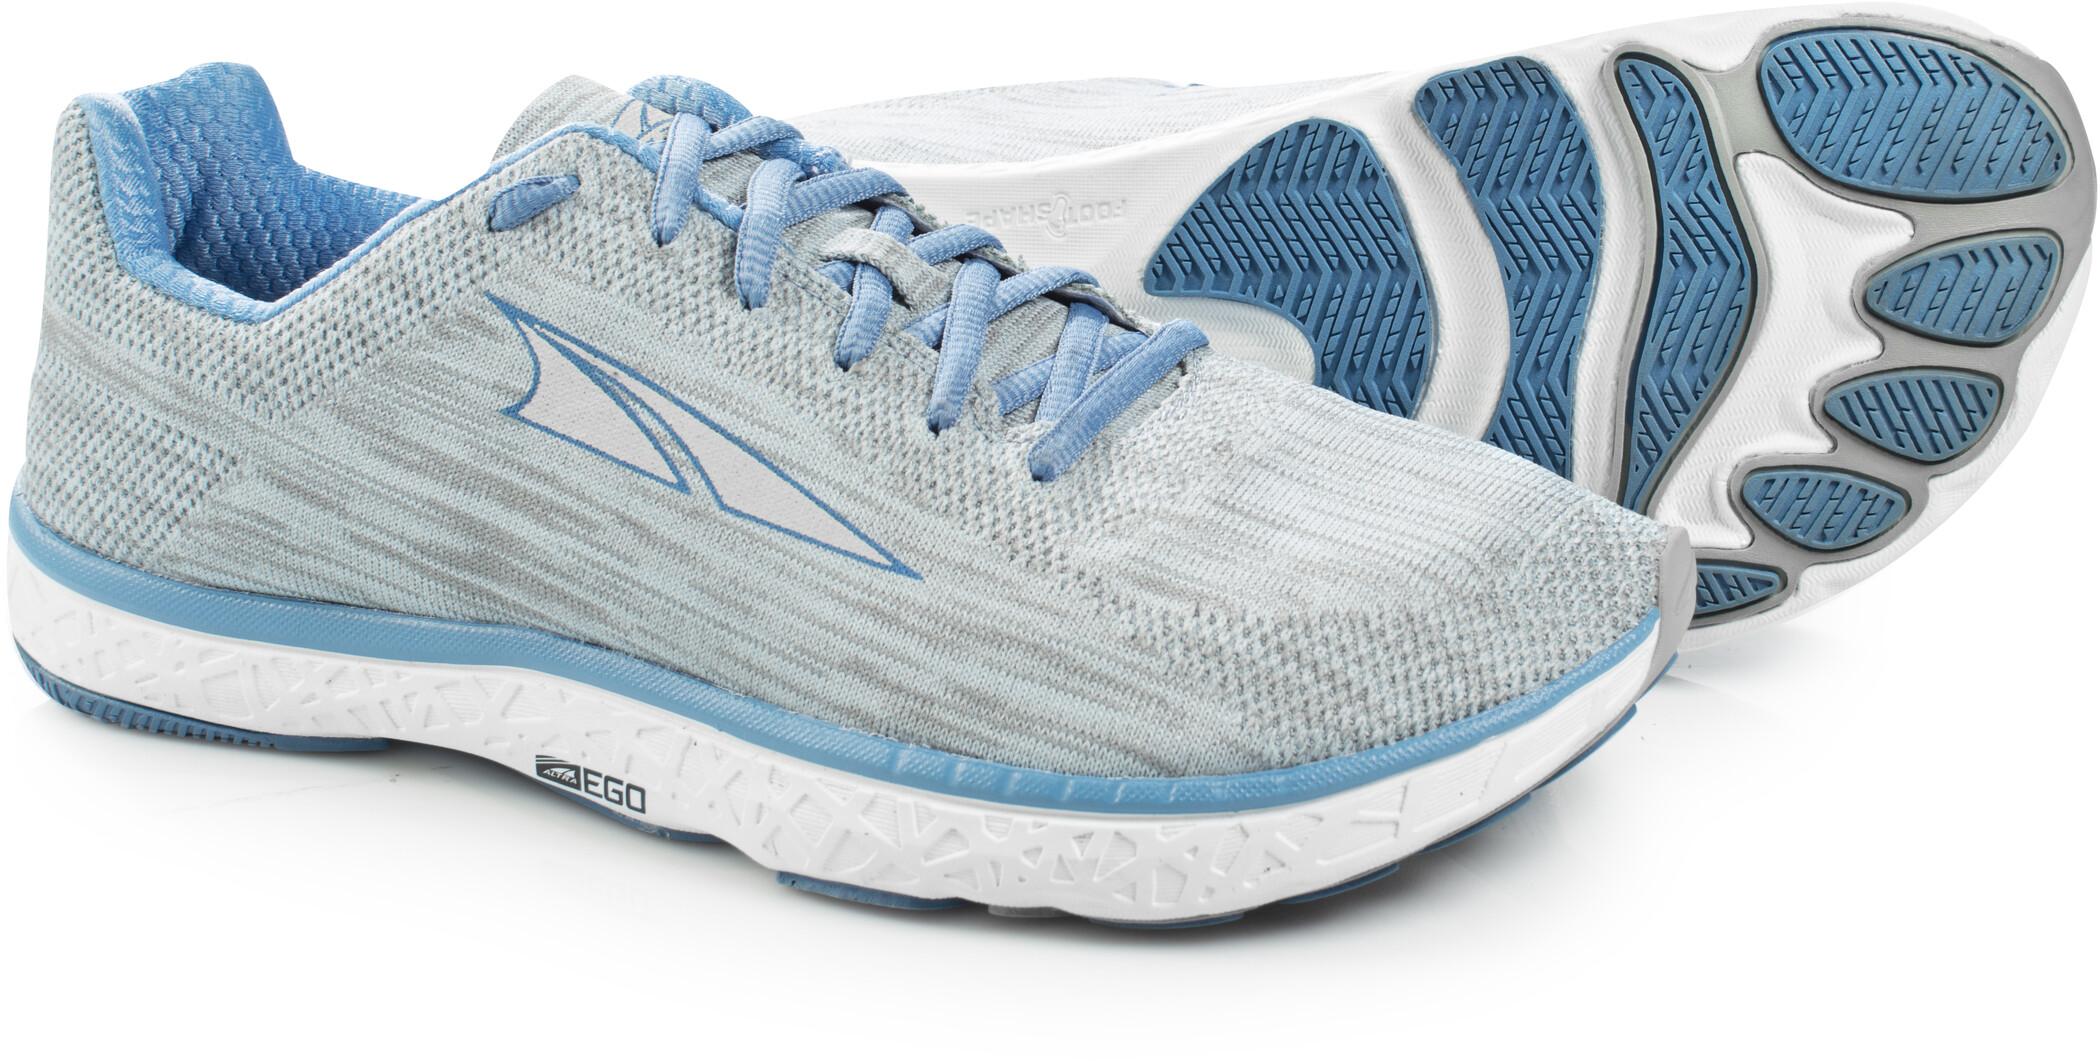 Altra Men's Escalante 1.5 Running Shoe | Sko